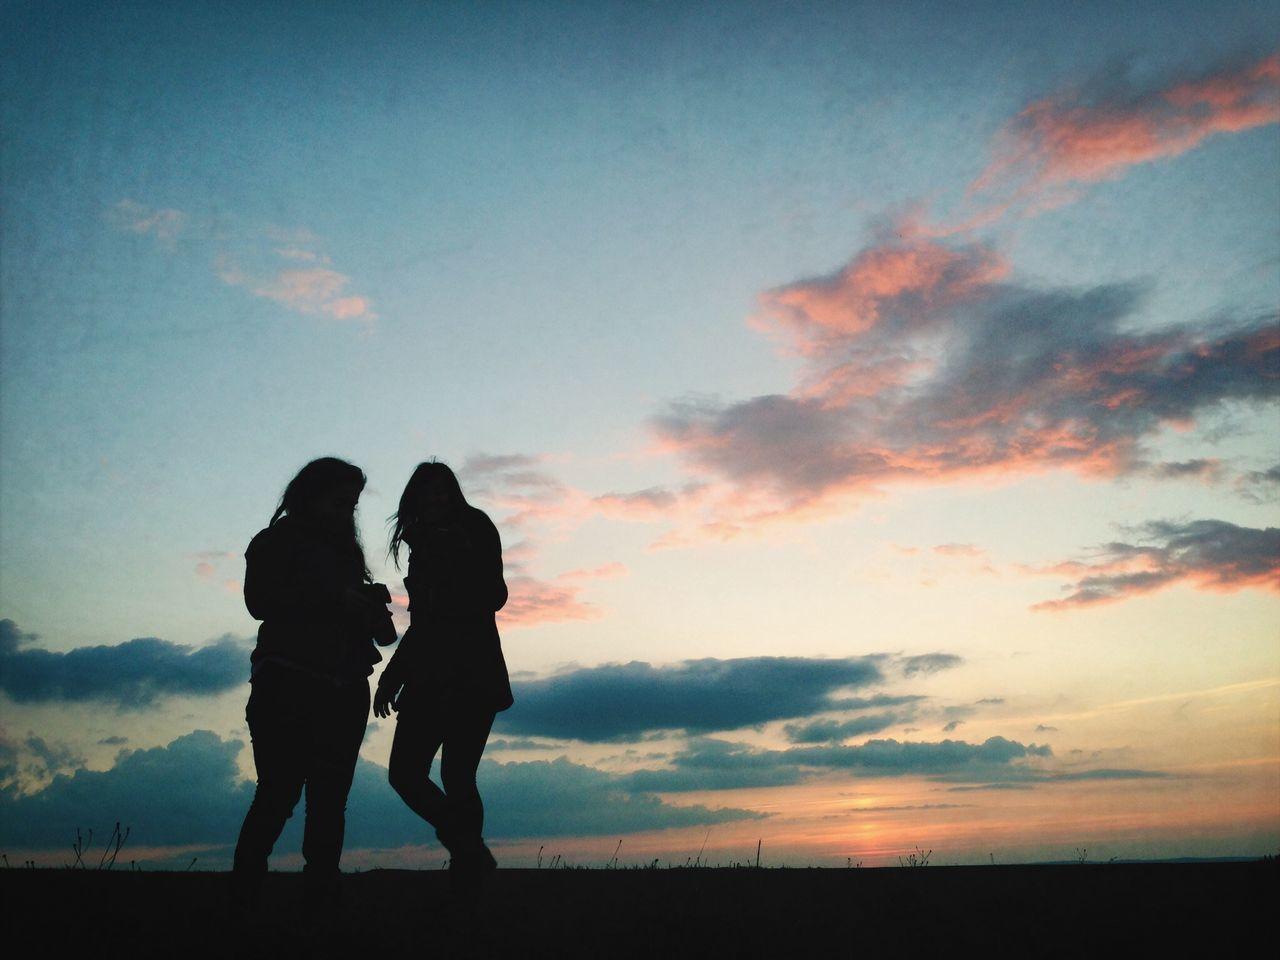 NEM Memories NEM GoodKarma The EyeEm Facebook Cover Challenge Sunset Silhouettes